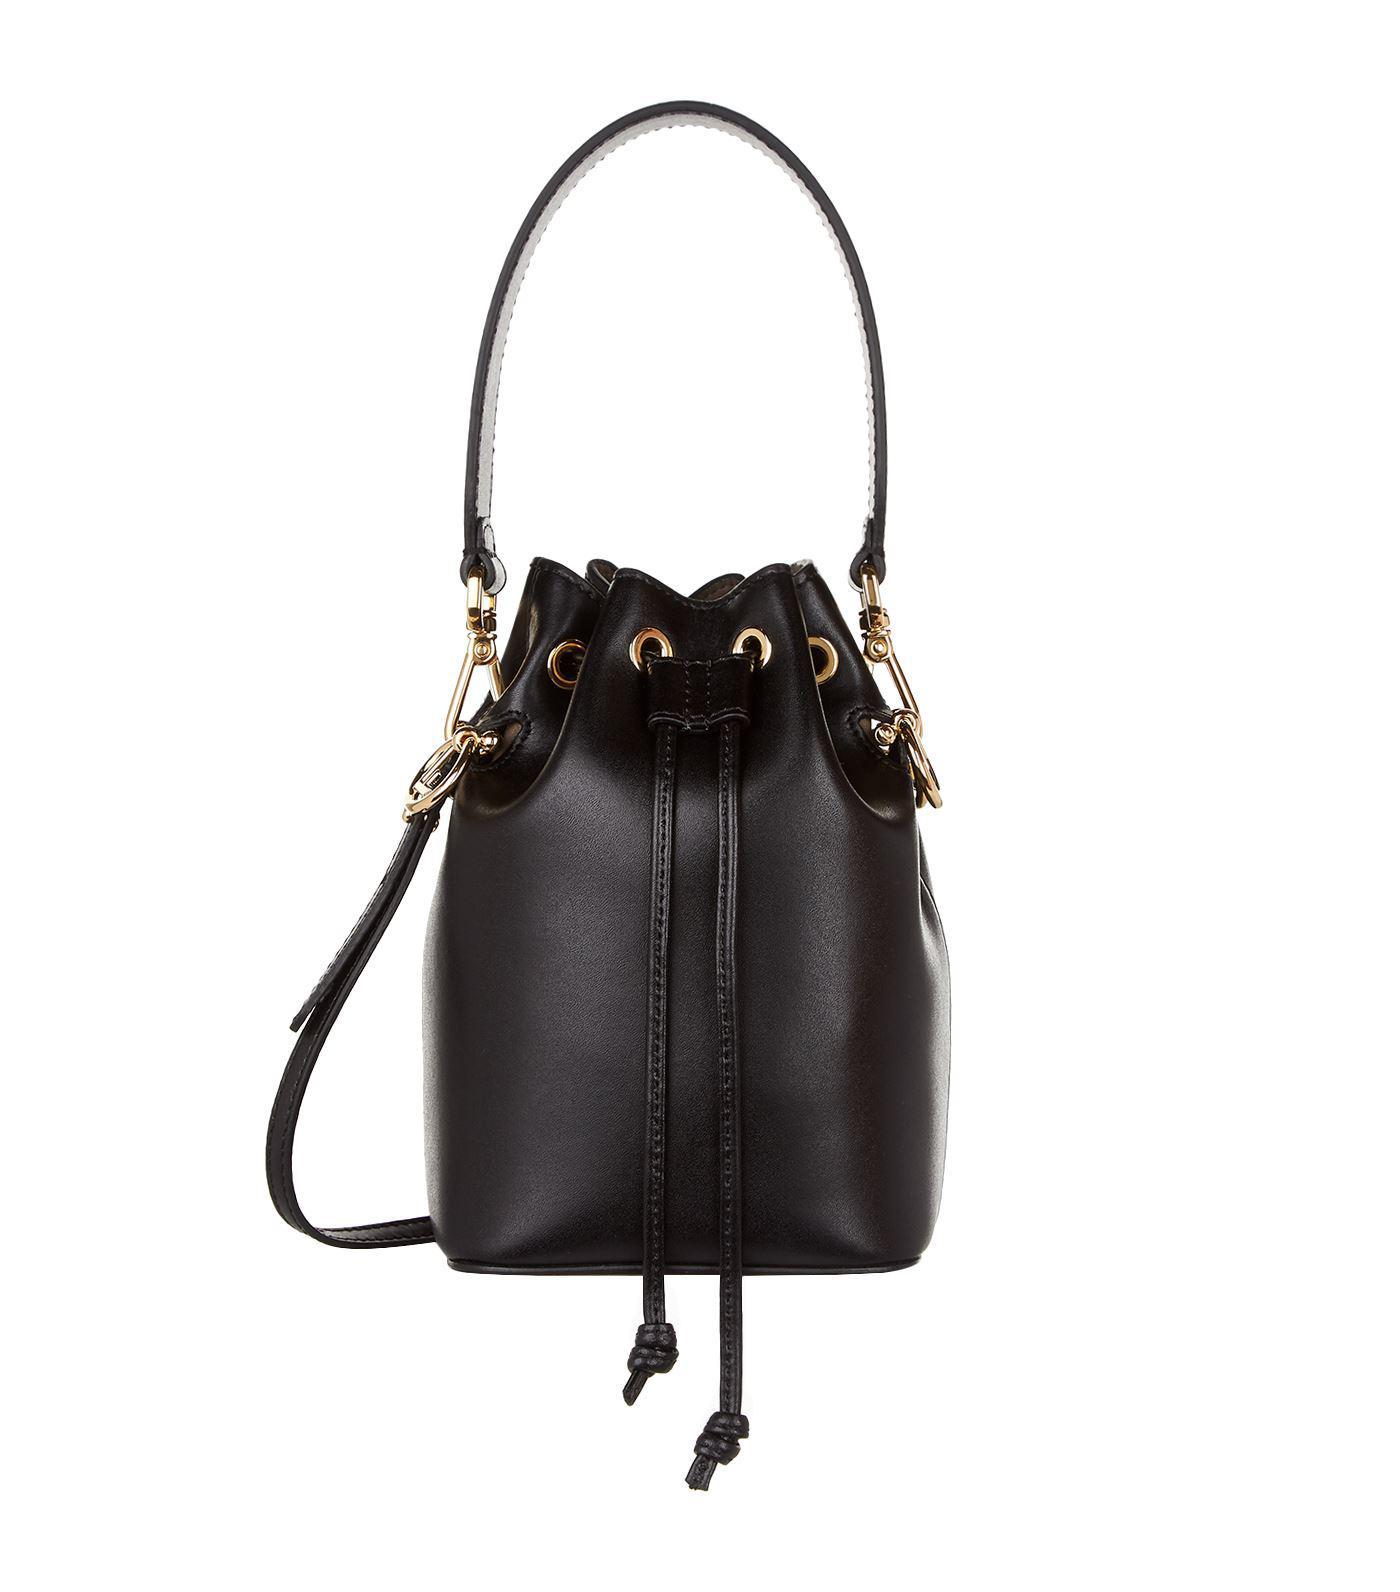 e54c680952d9 Lyst - Fendi Mini Mon Tresor Leather Bucket Bag in Black - Save 9%